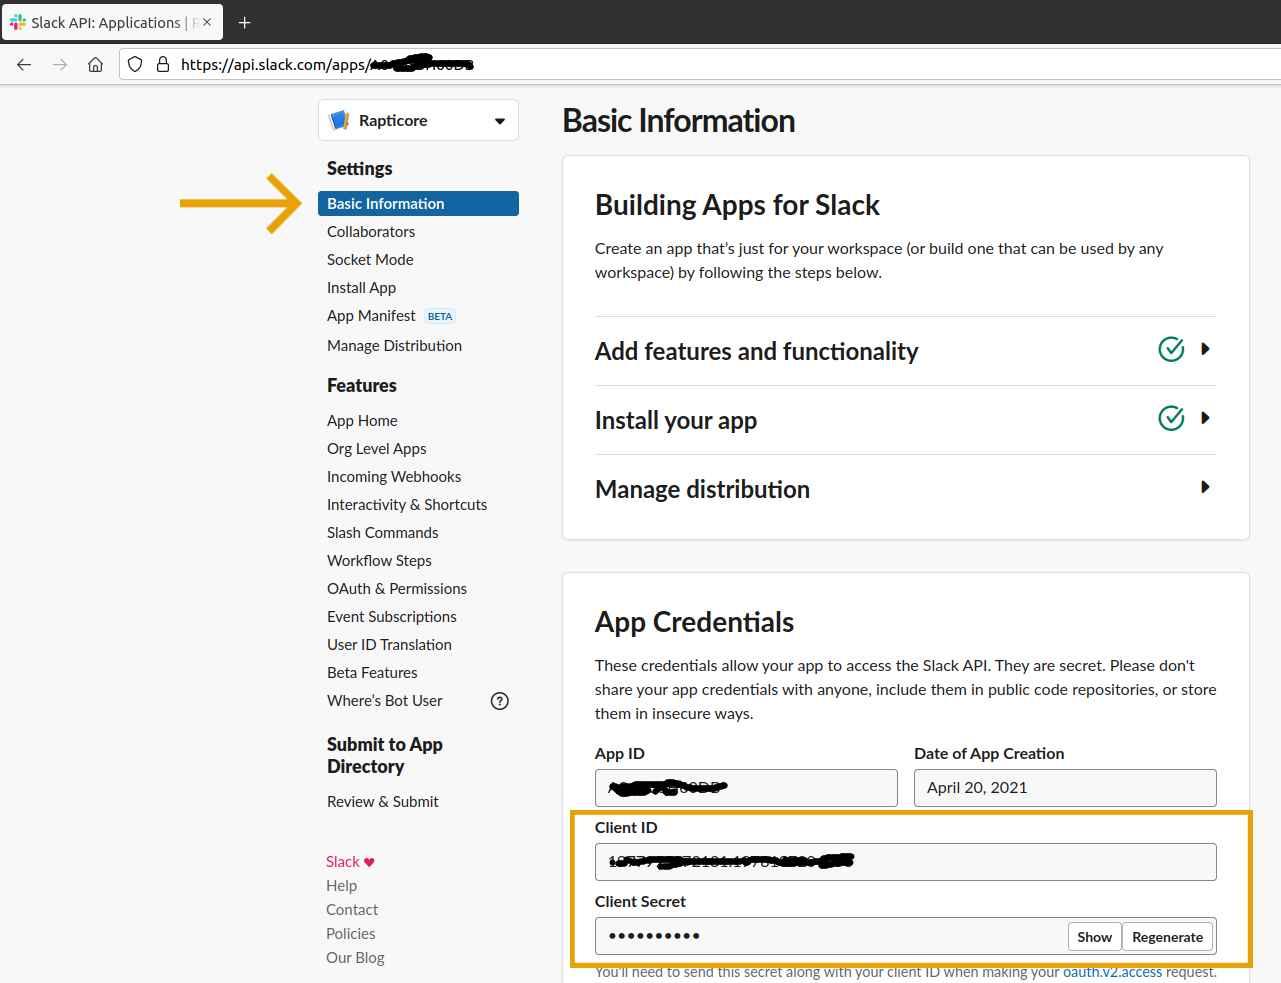 Acquiring Slack App Client Id and Secret.